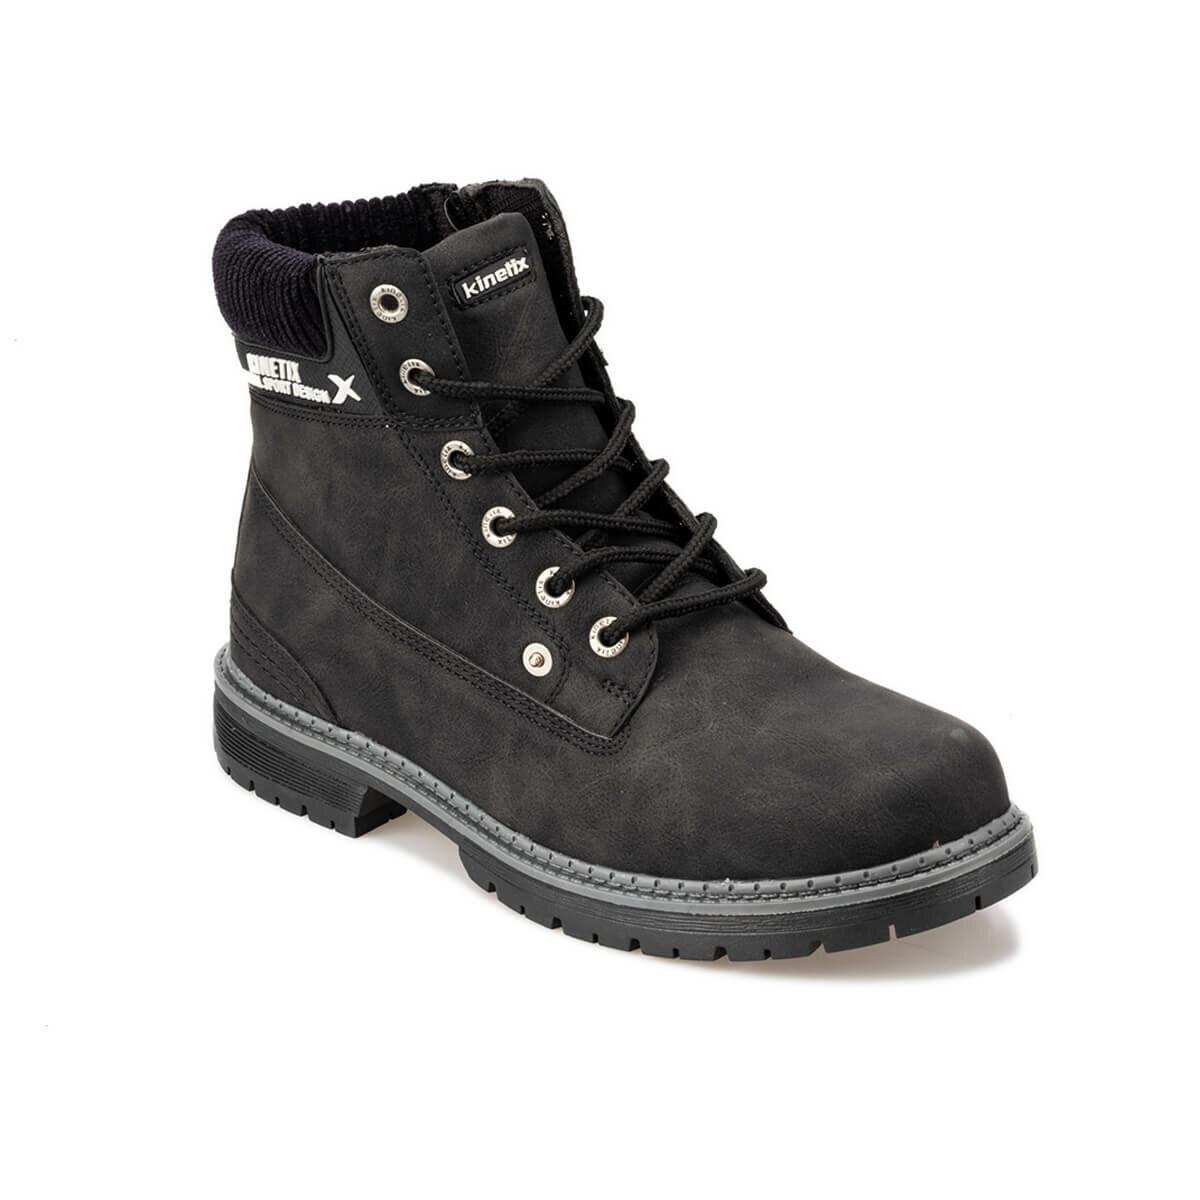 FLO Black Men Boots Casual Zipper Winter Boots Men Safety Shoes Boots For Men KINETIX IRON 9PR